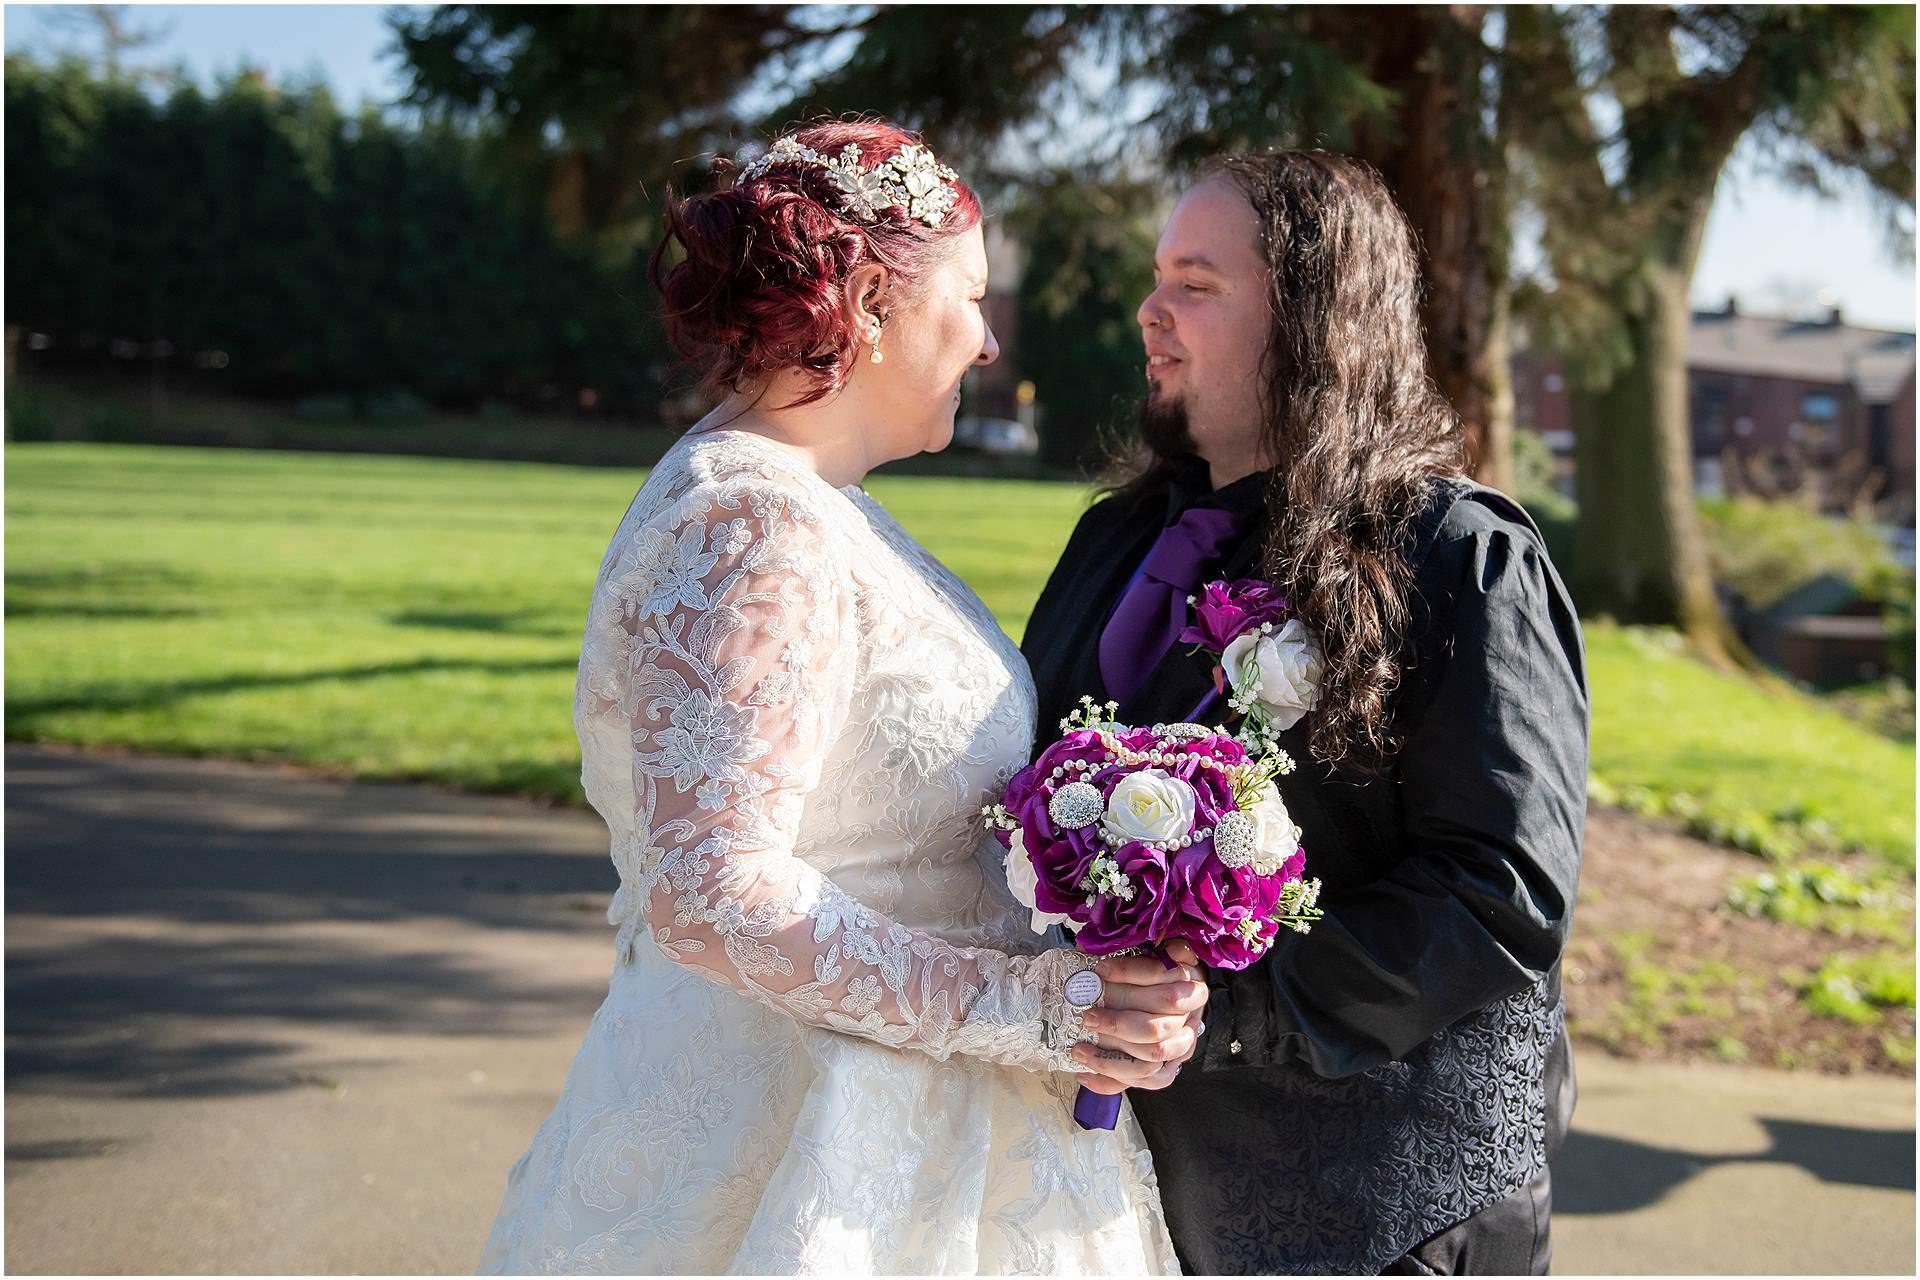 wedding_photography at dukinfield_townhall with sarah_bee_photography dukinfield_park dukinfeild_cheshire_2005.jpg